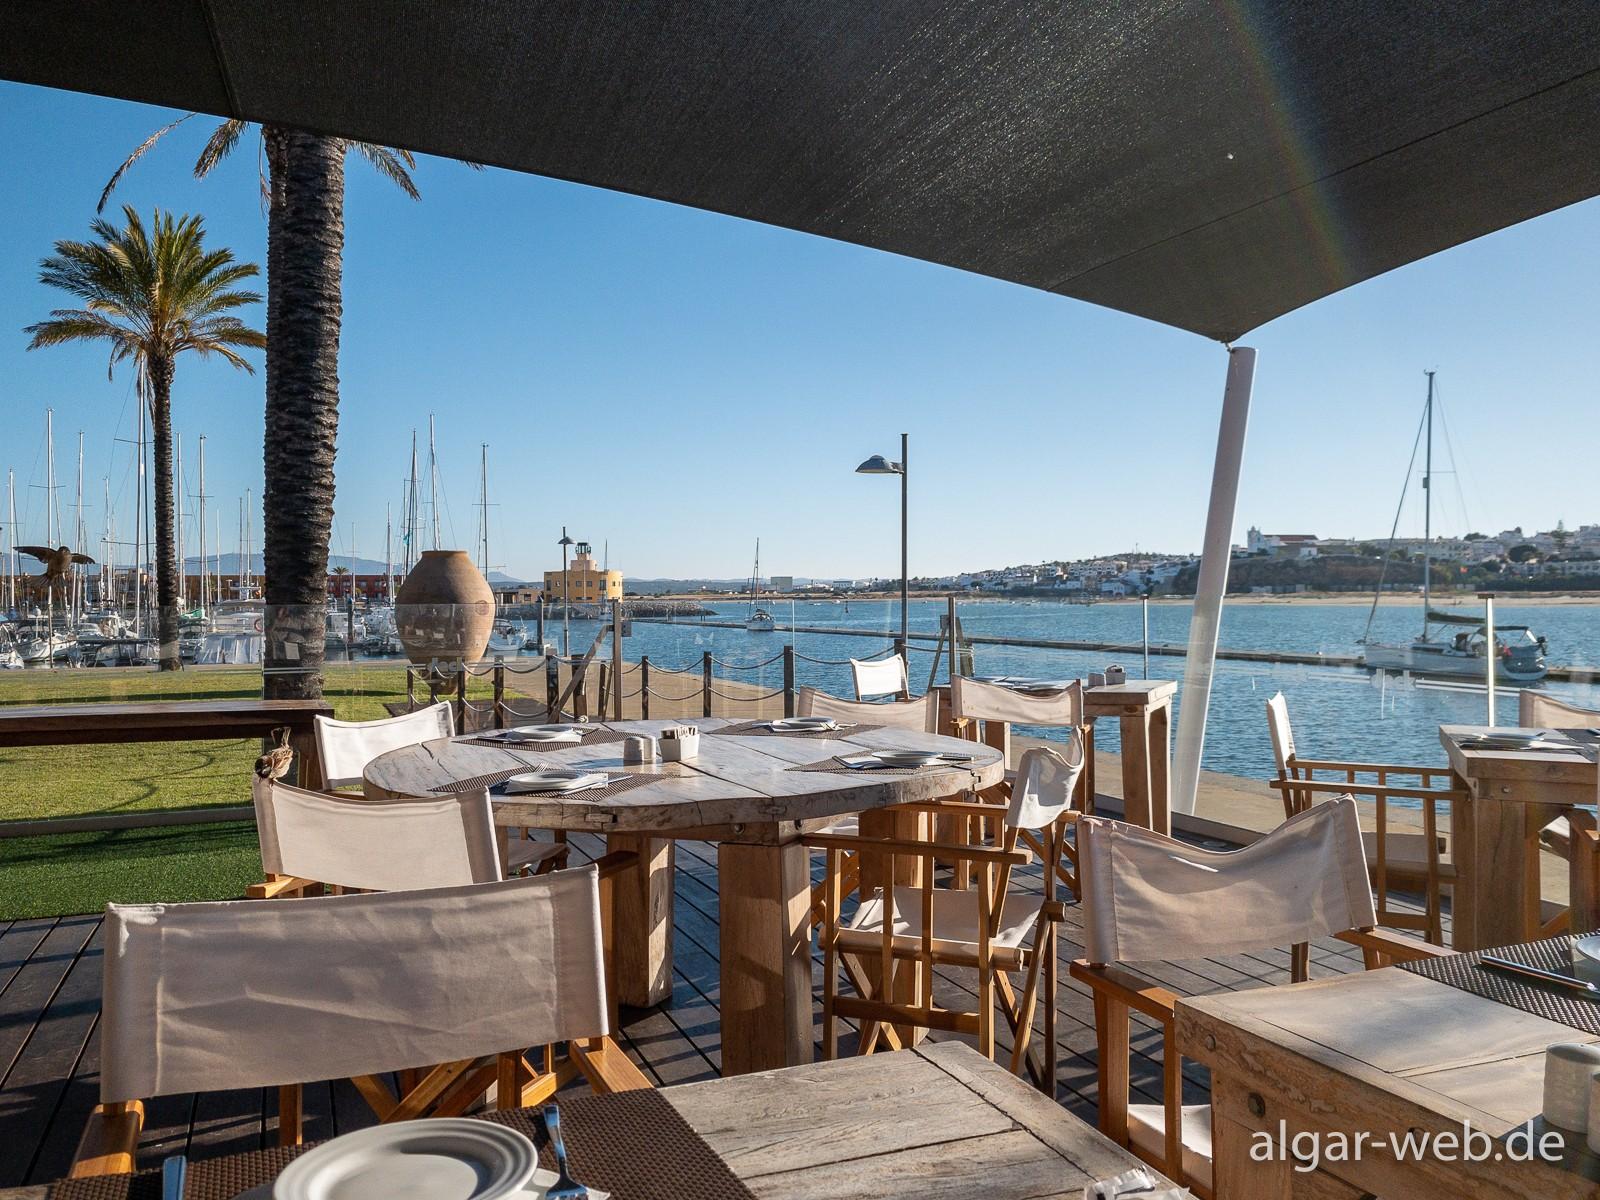 Hotel Tivoli Marina - Frühstücksterrasse am Fluss